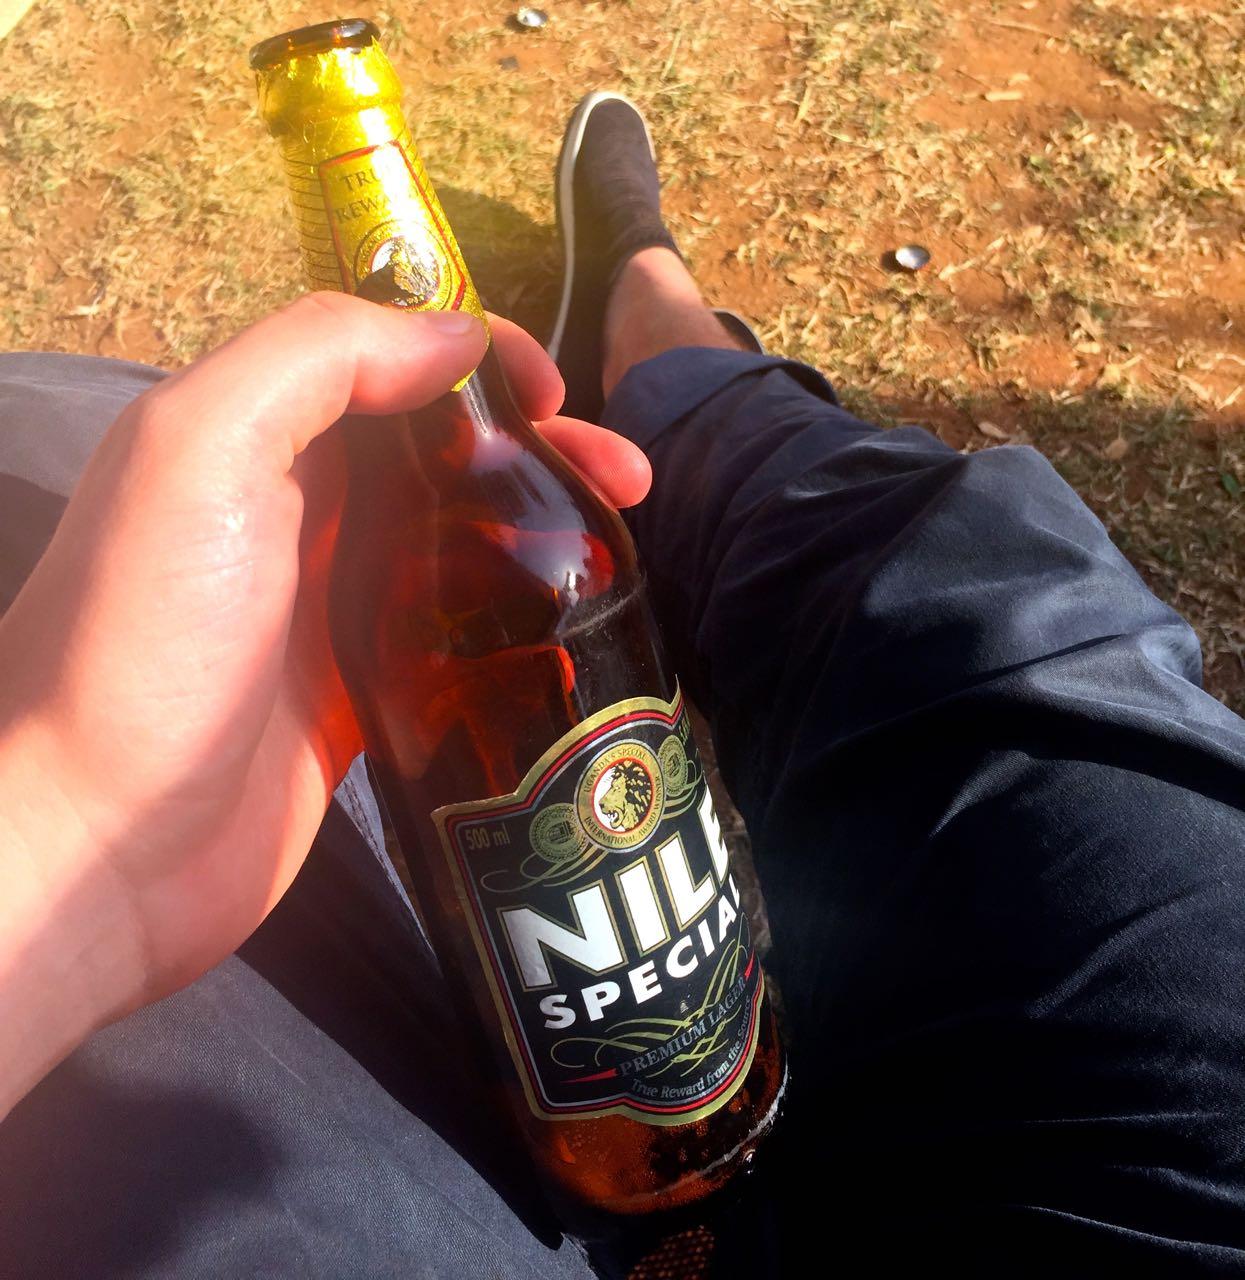 Nil-Special-Beer-Uganda